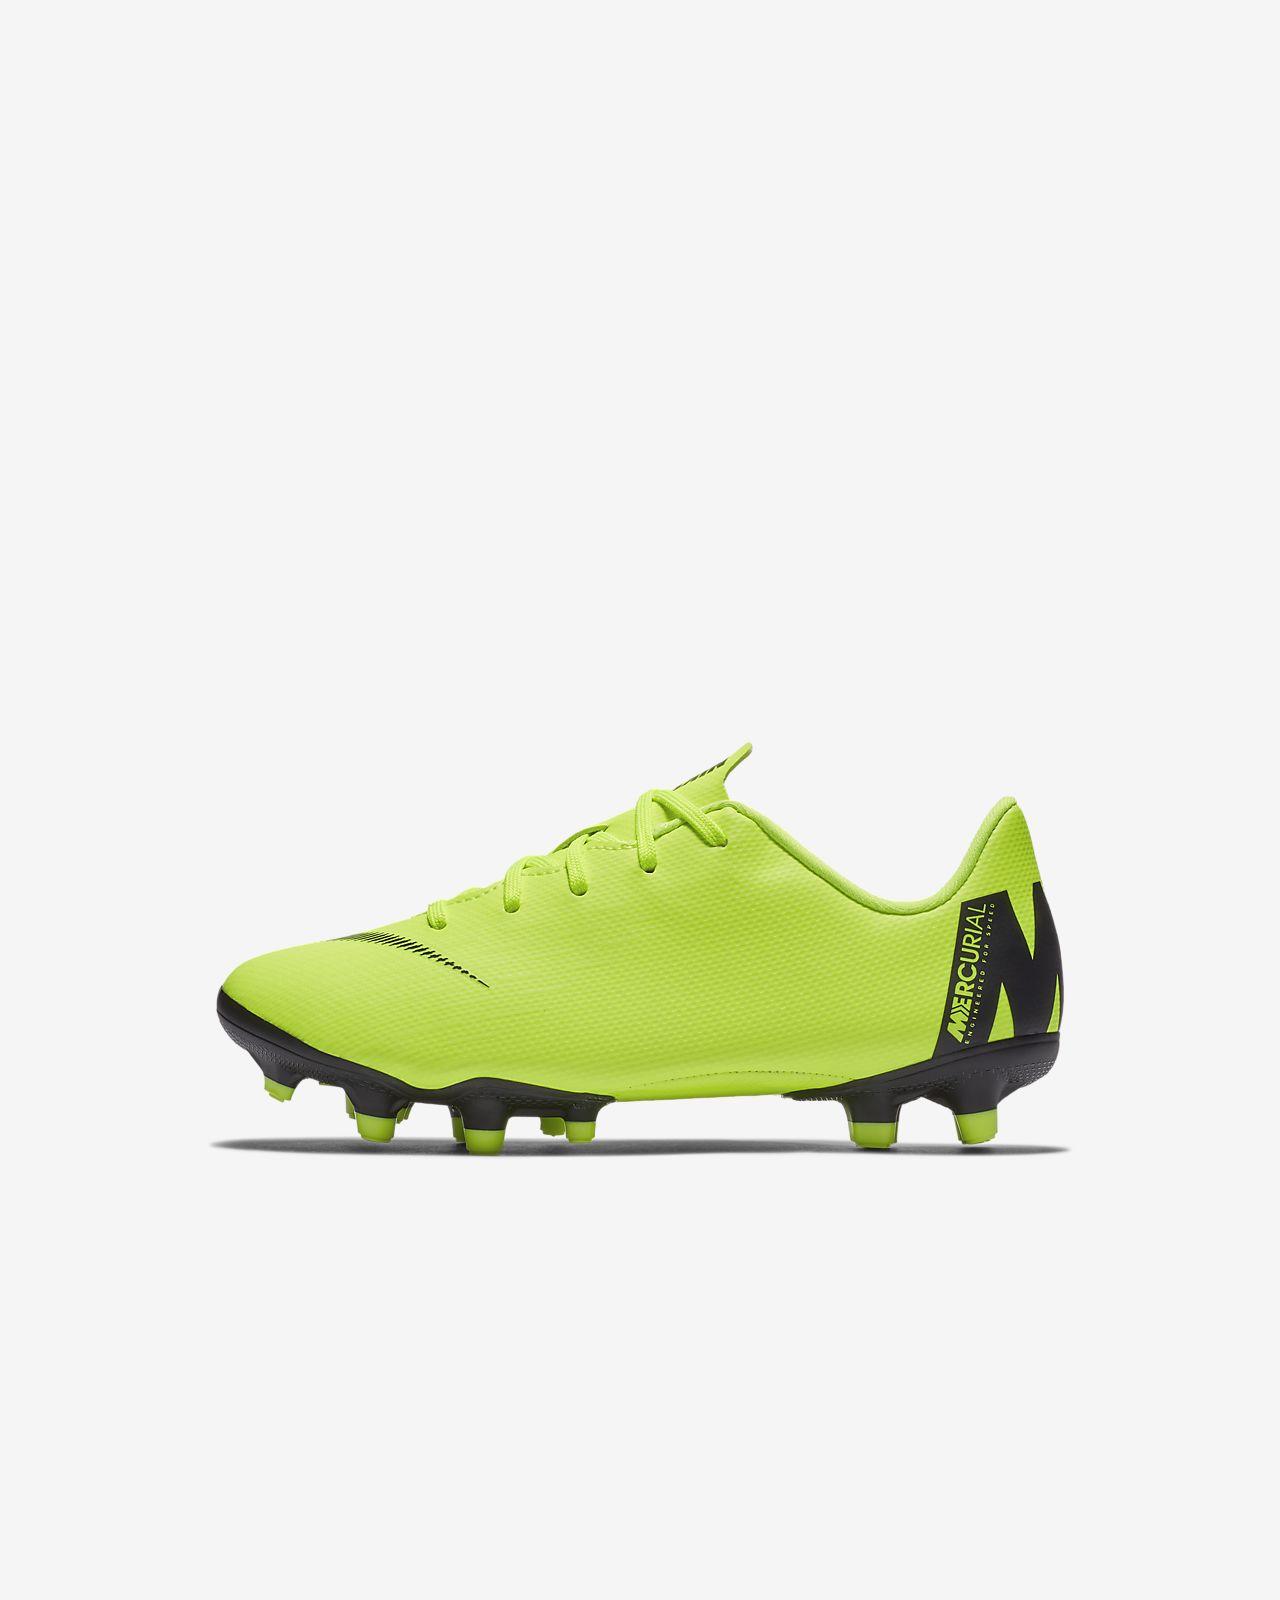 456c9ddb2c800 ... Nike Jr. MercurialX Vapor XII Academy Botas de fútbol para múltiples  superficies - Niño